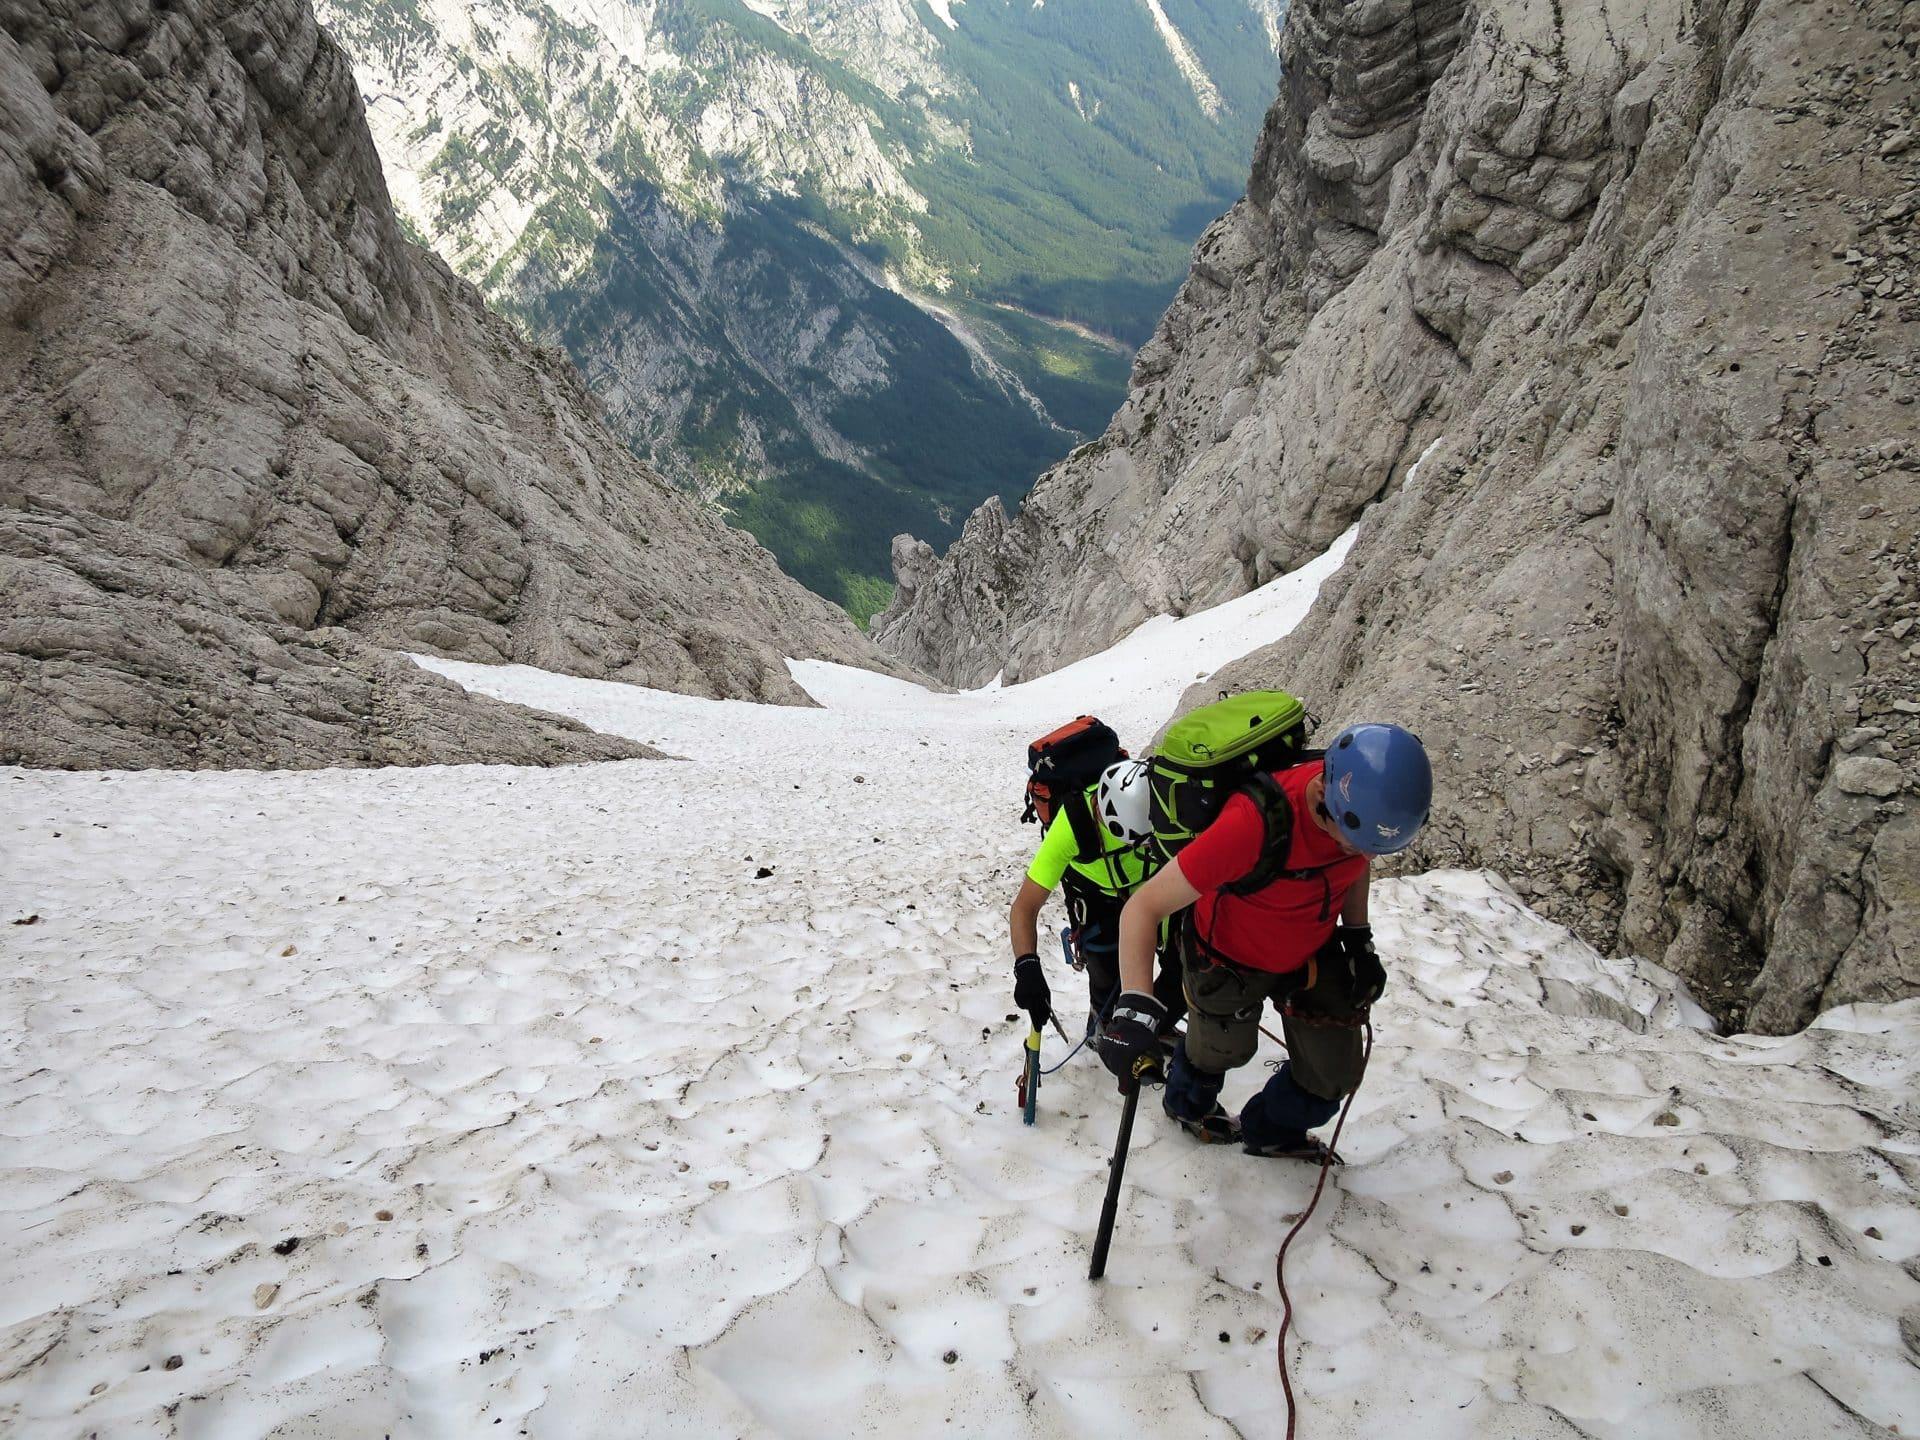 Summer alpine climbing course in Slovenia, level 2